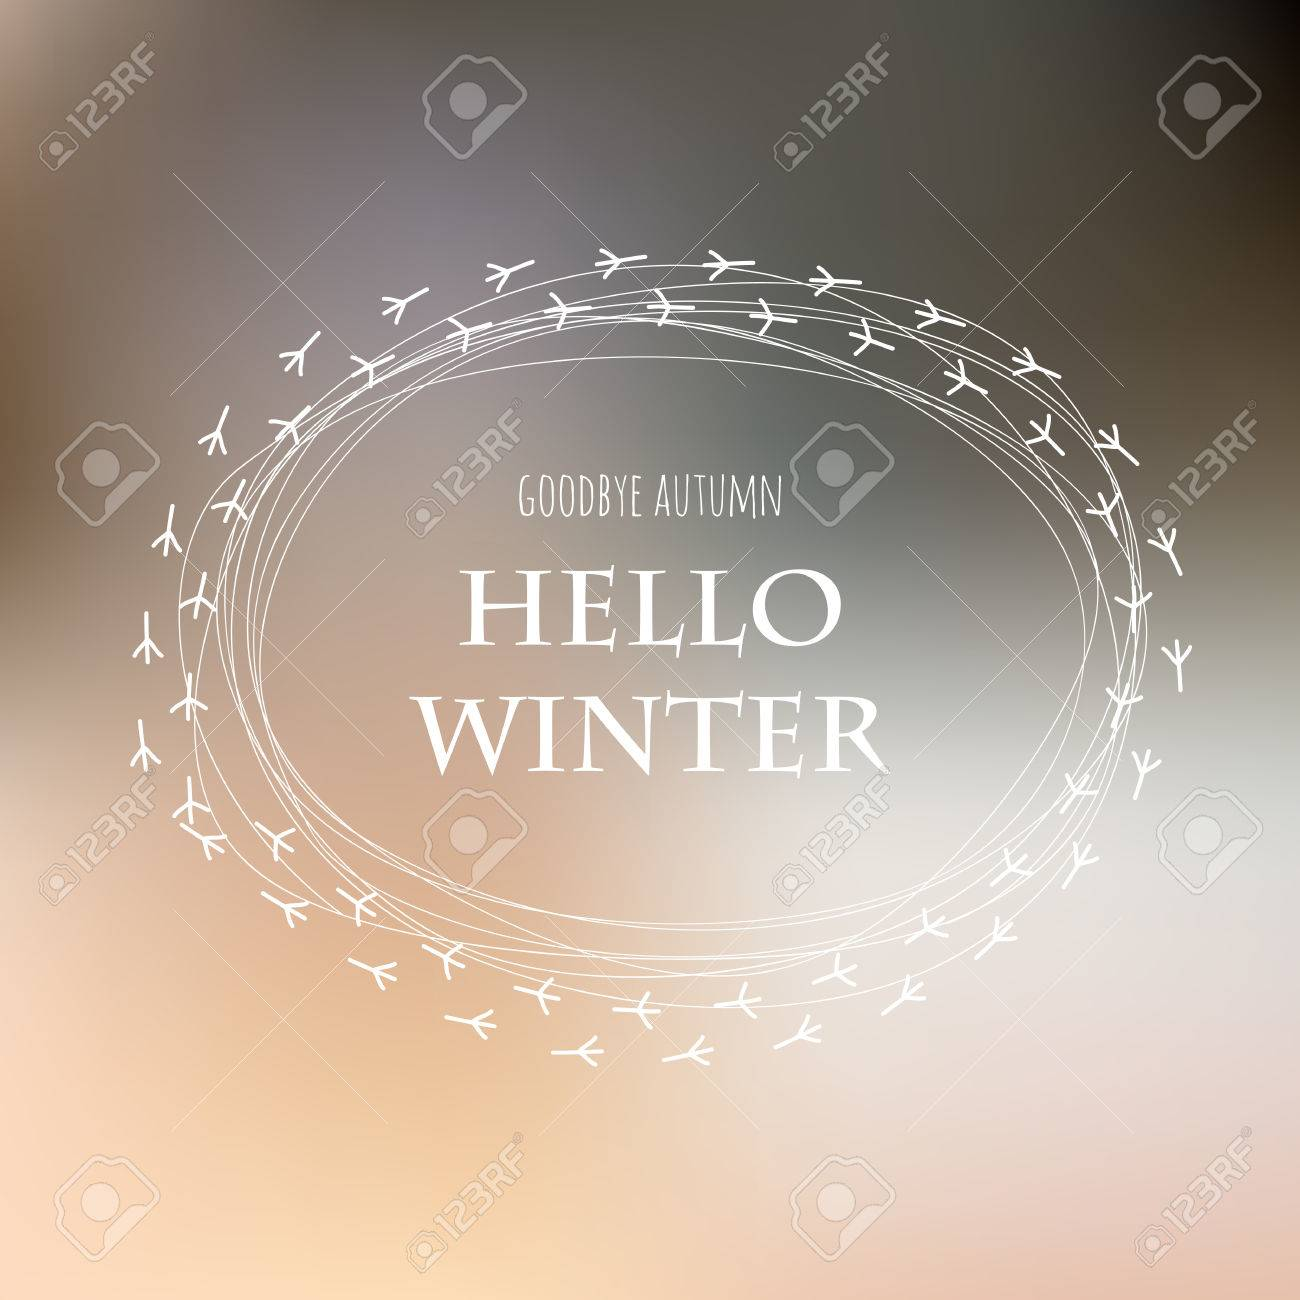 Goodbye Autumn Hello Winter. Bird Footprints Lettering. Card Design Light  Blur Background. Season